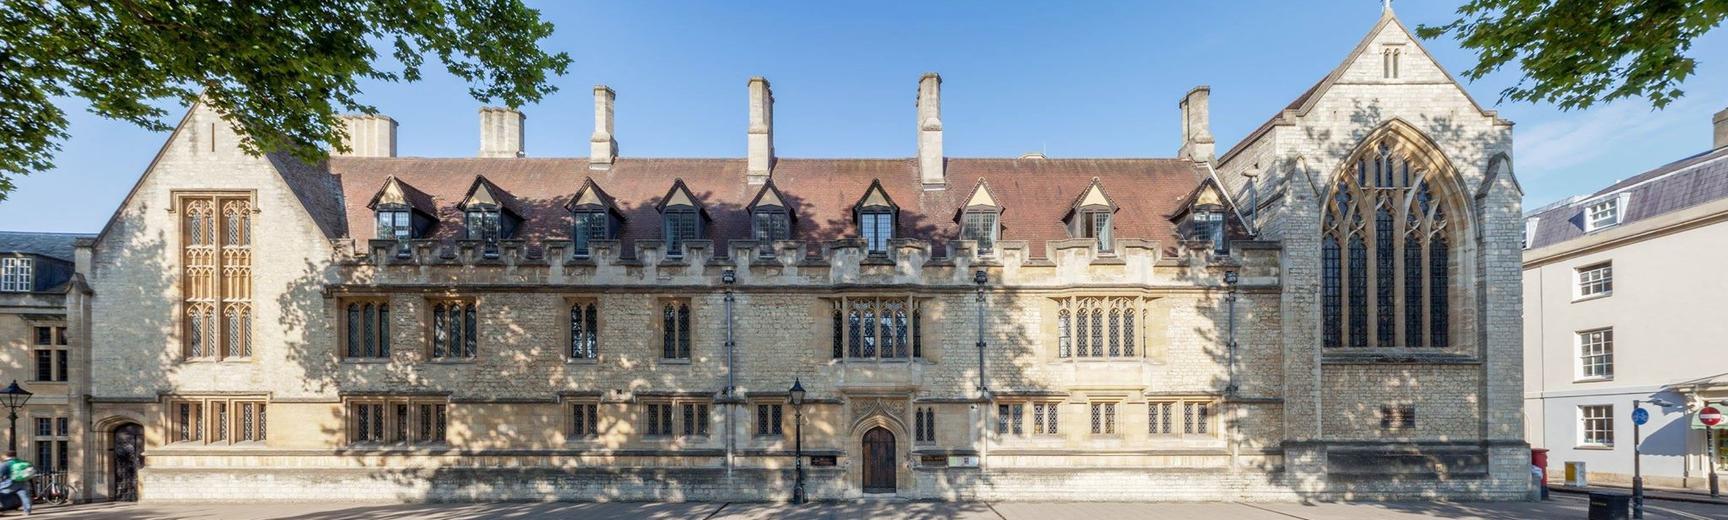 Exterior of St Cross College